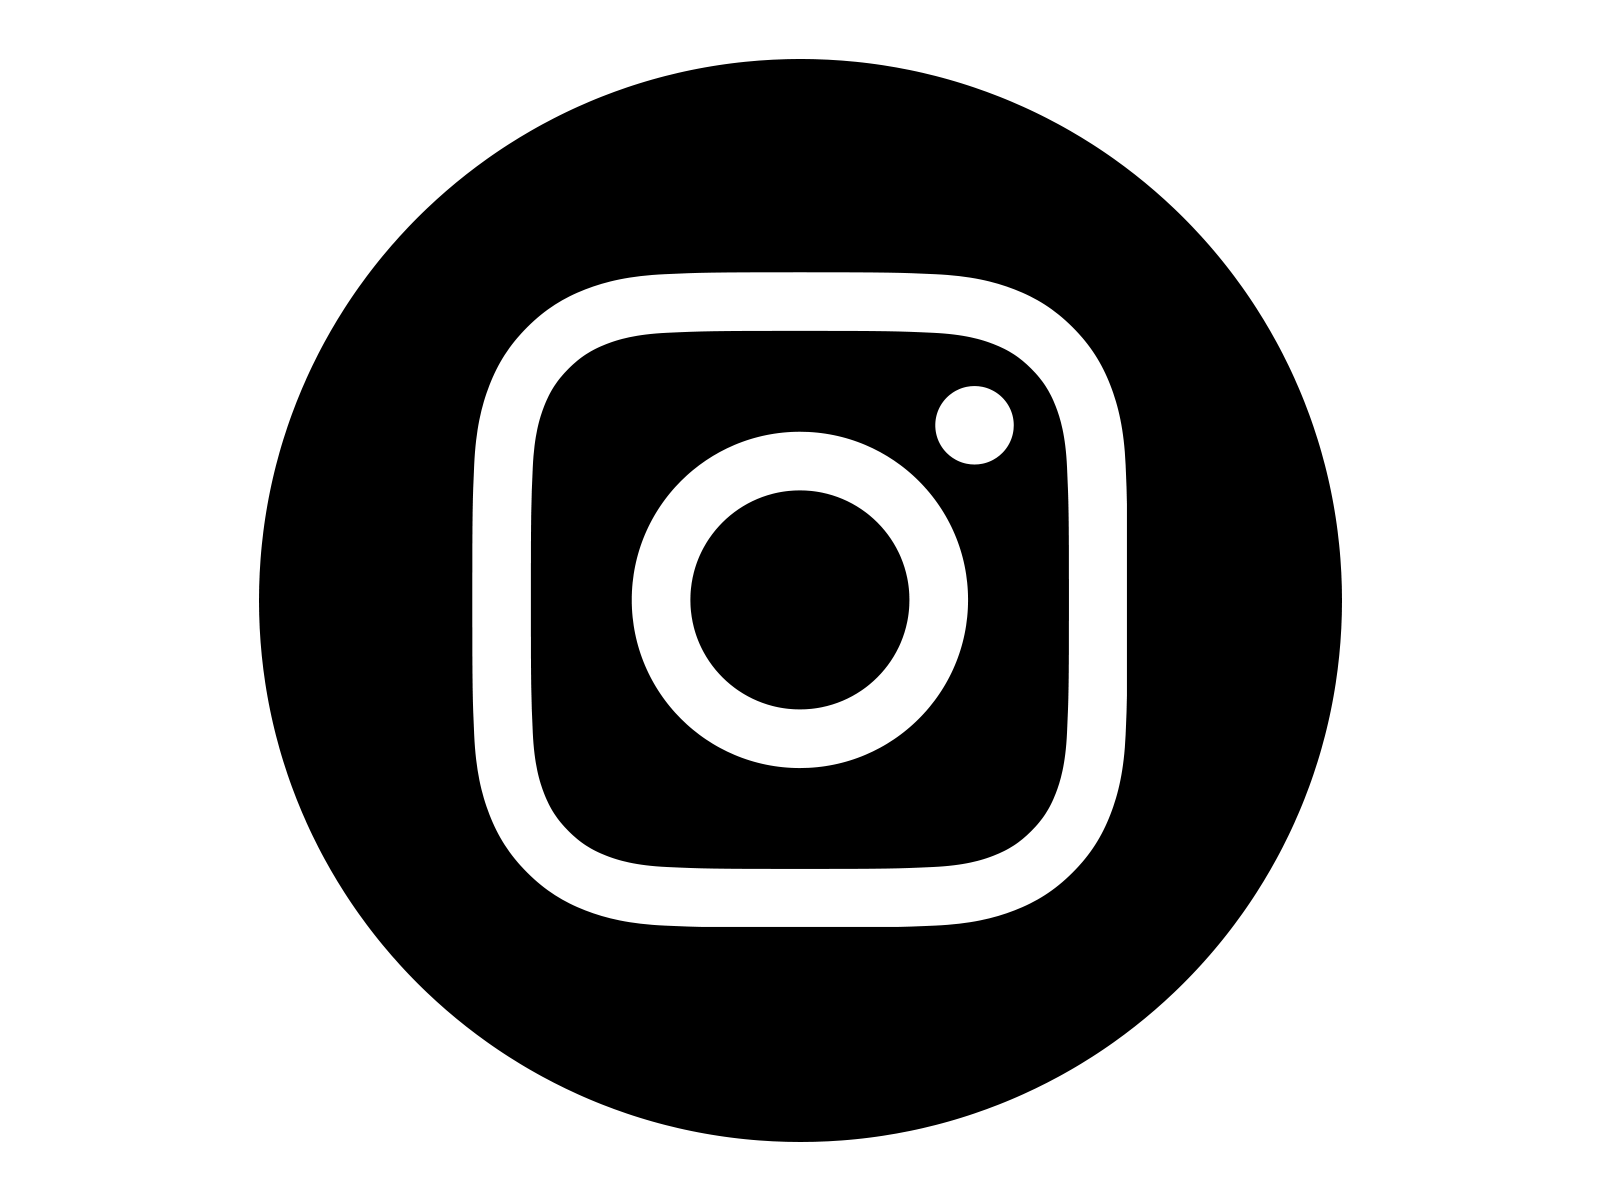 instagram logo bw